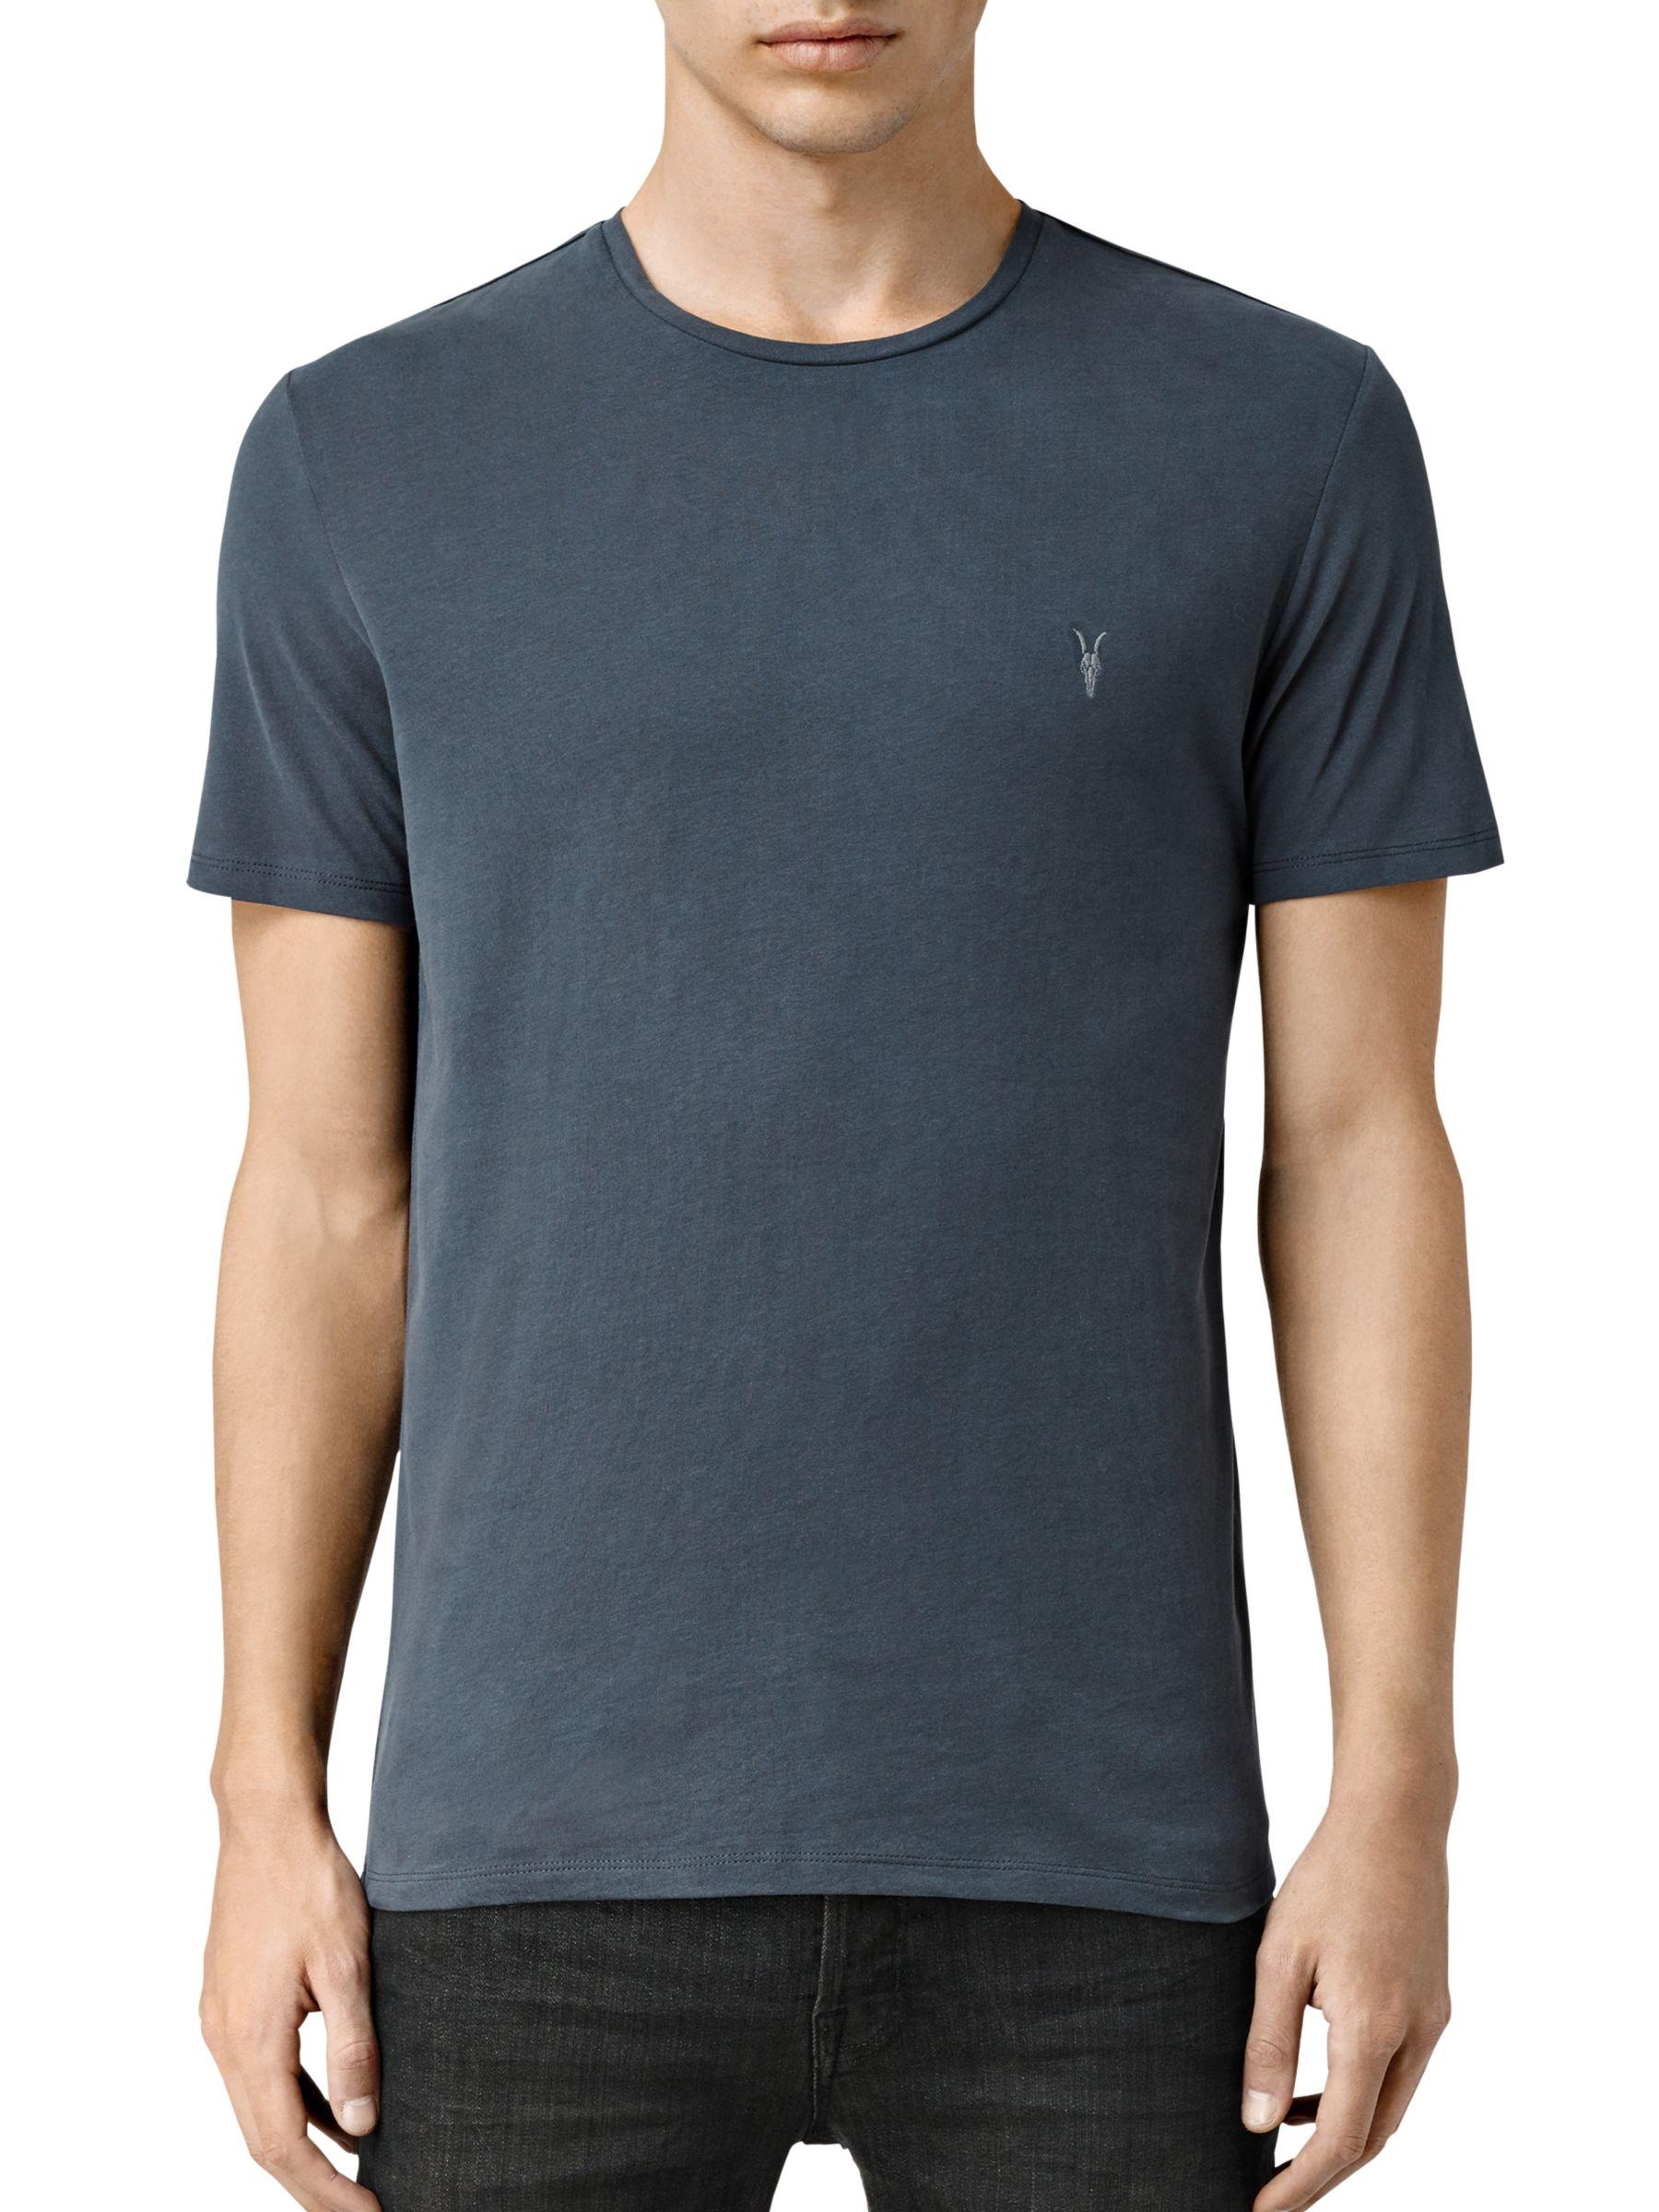 AllSaints Brace Tonic Crew Neck T Shirt at John Lewis & Partners